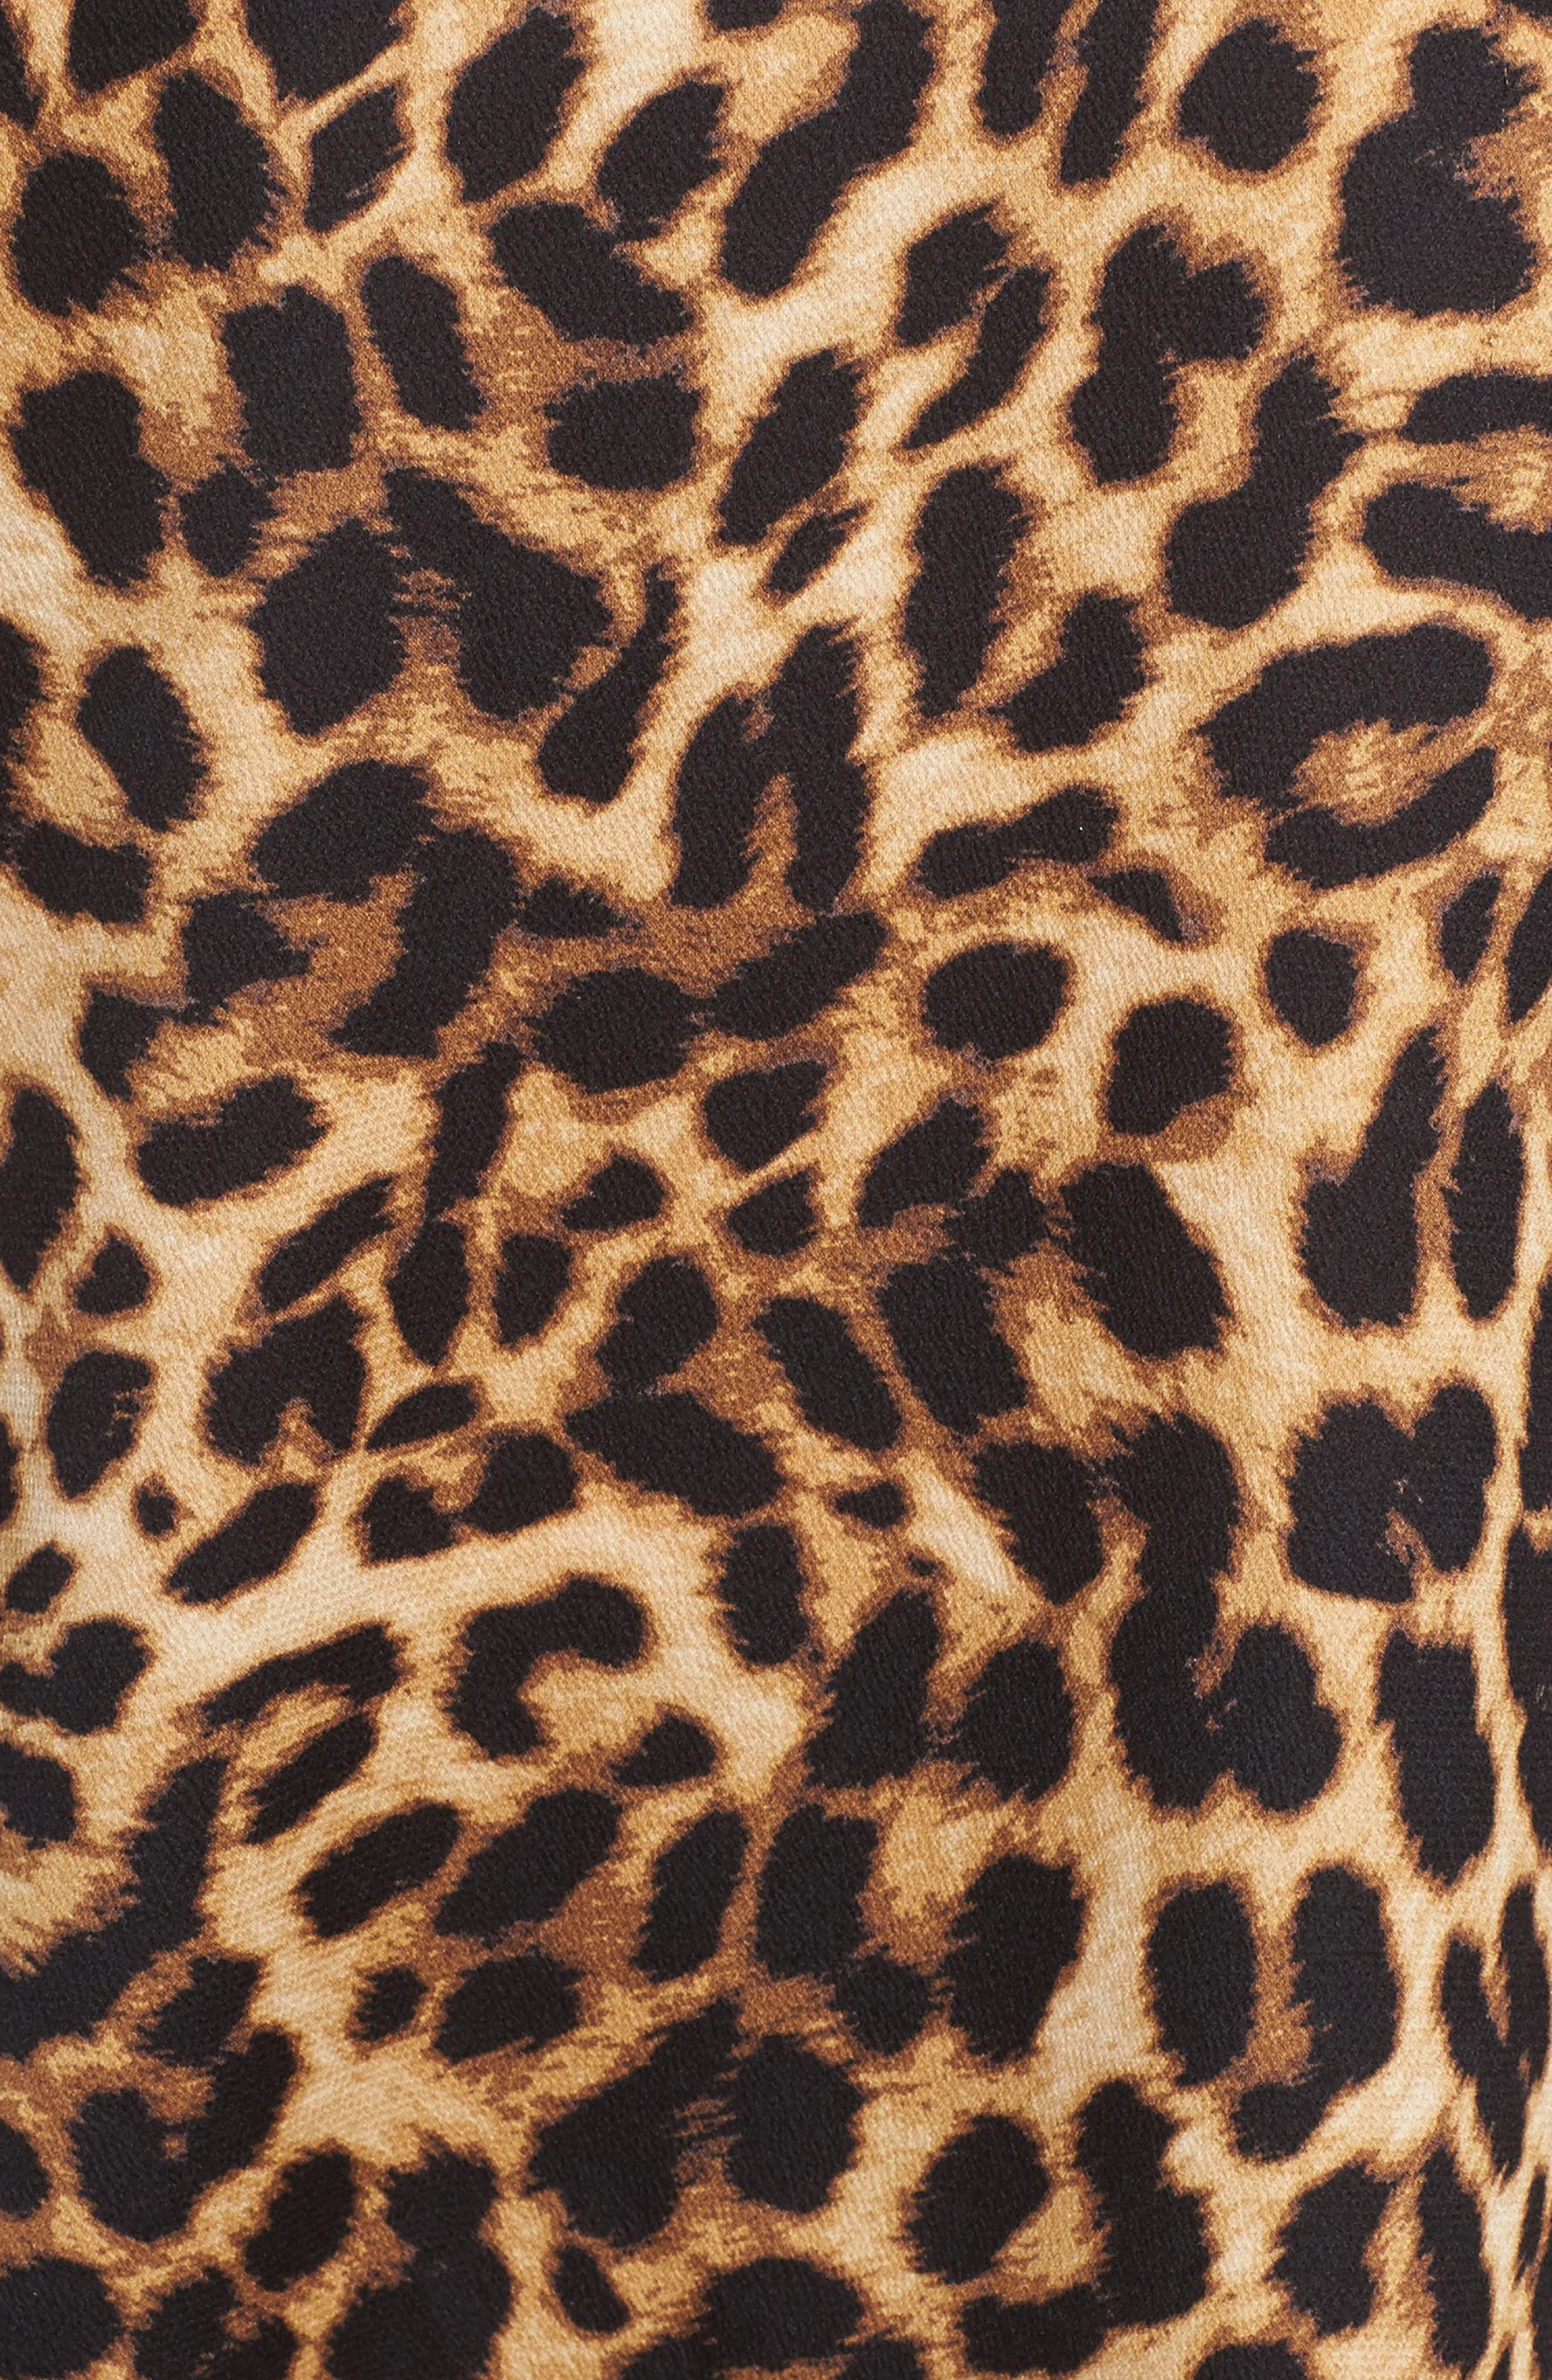 Mock Choker Neck Leopard Print Top,                             Alternate thumbnail 5, color,                             019